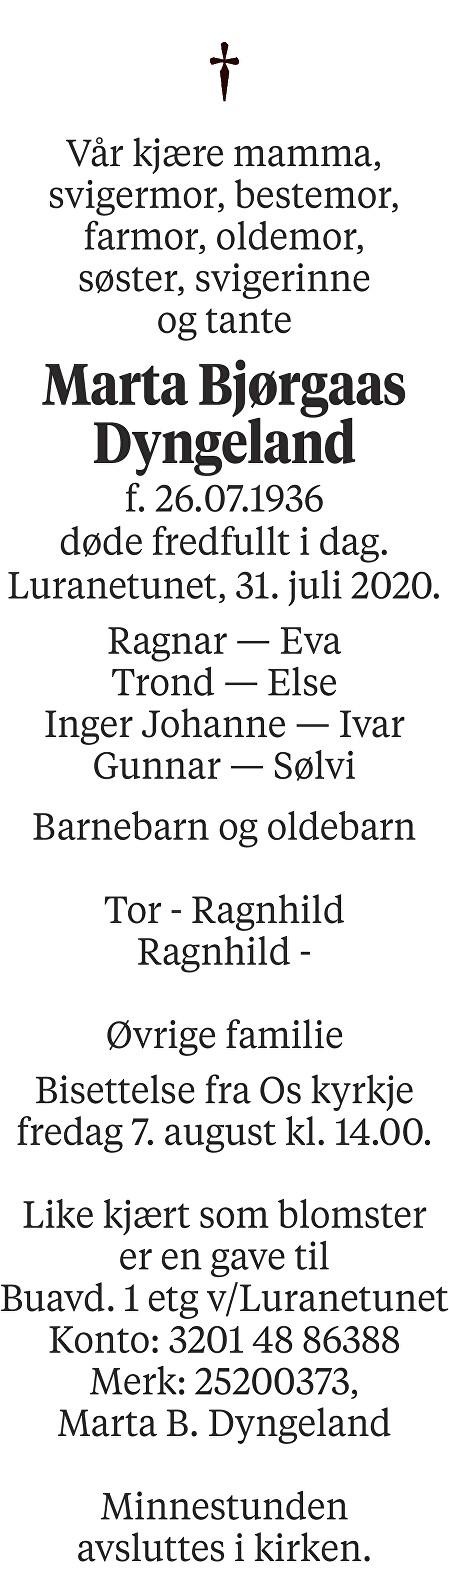 Marta Bjørgaas Dyngeland Dødsannonse